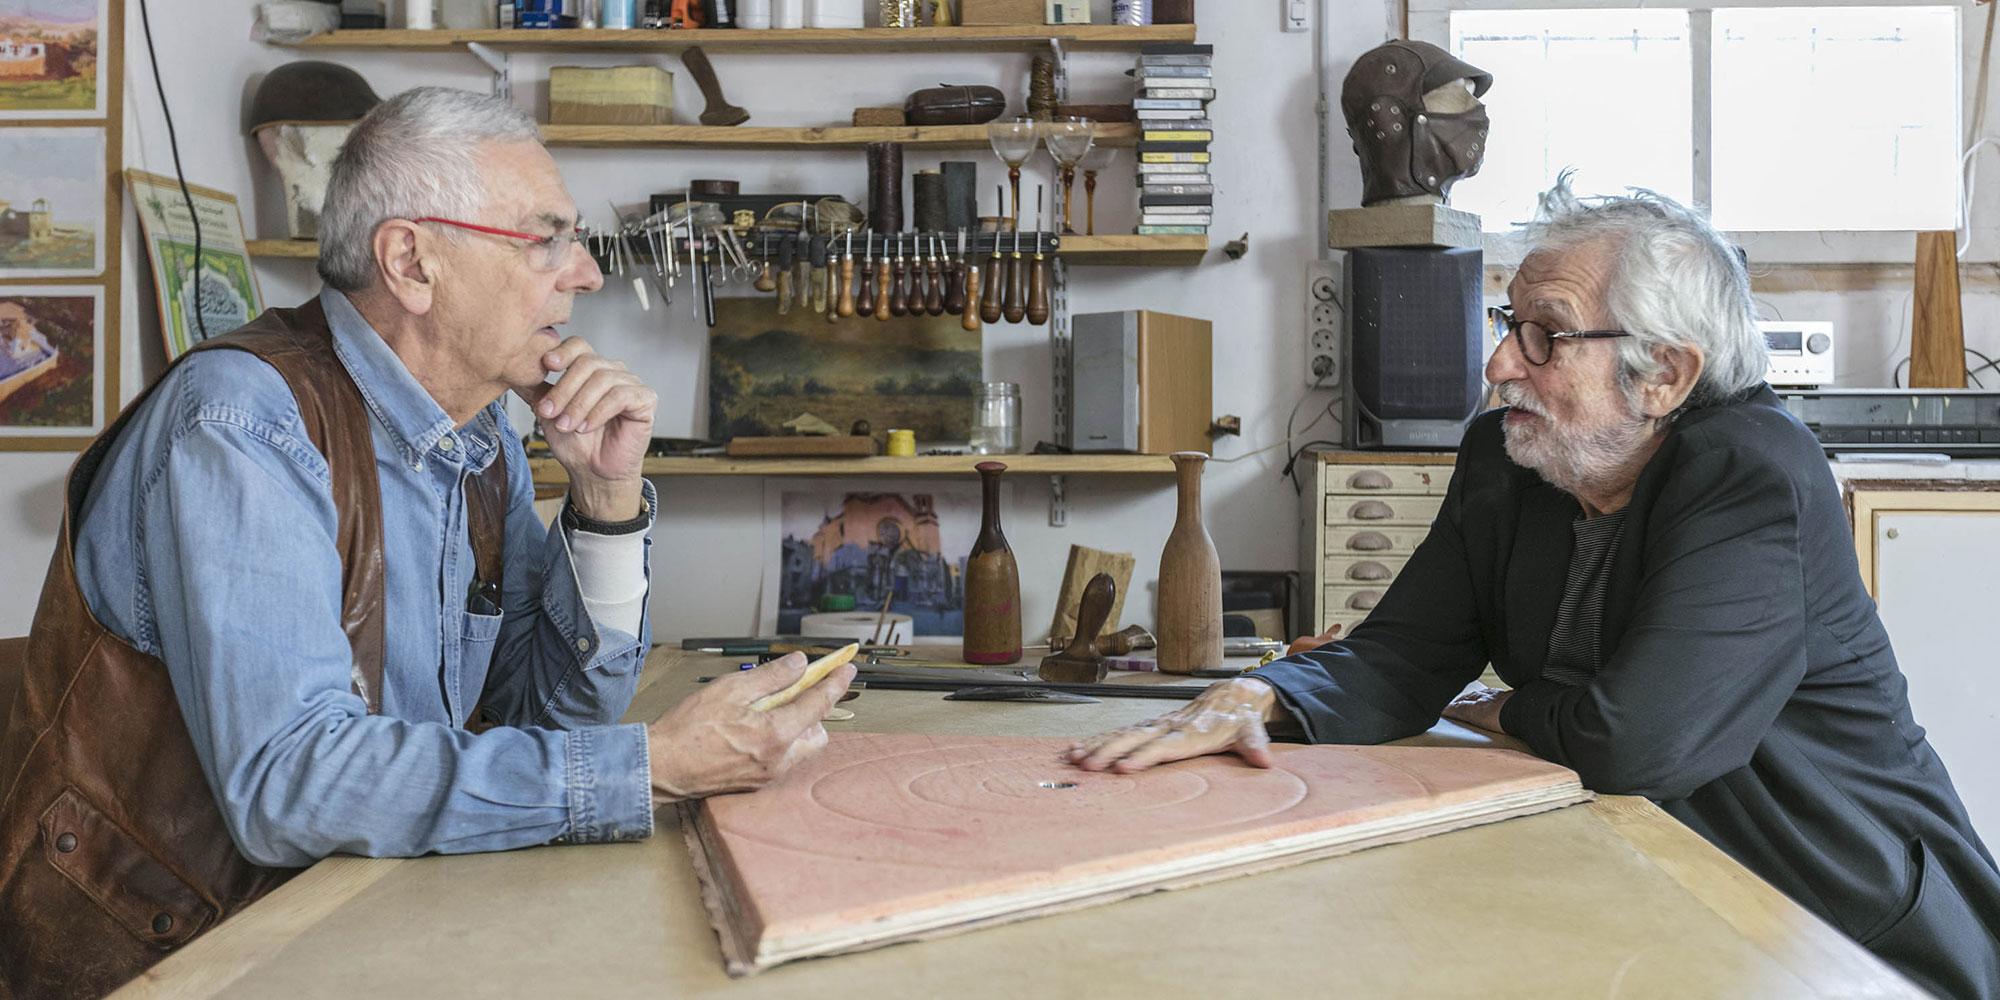 Filigree and Azulejos Heritage at Homo Faber 2876 creativity craftsmanship